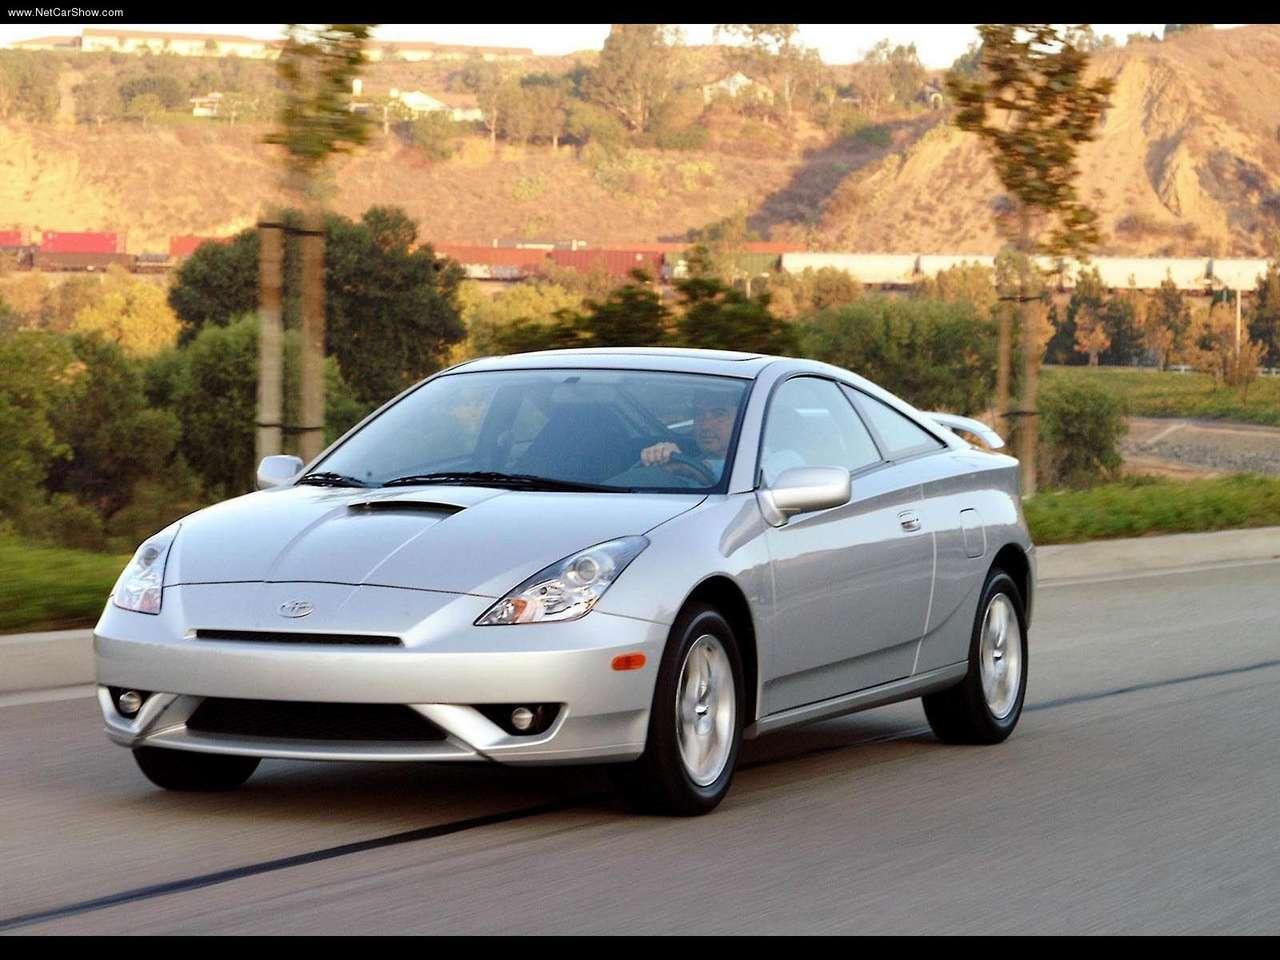 http://3.bp.blogspot.com/_lsyt_wQ2awY/TGJtHg6suPI/AAAAAAACDYM/XMluJGASZtA/s1600/Toyota-Celica_GTS_2003_1280x960_wallpaper_05.jpg